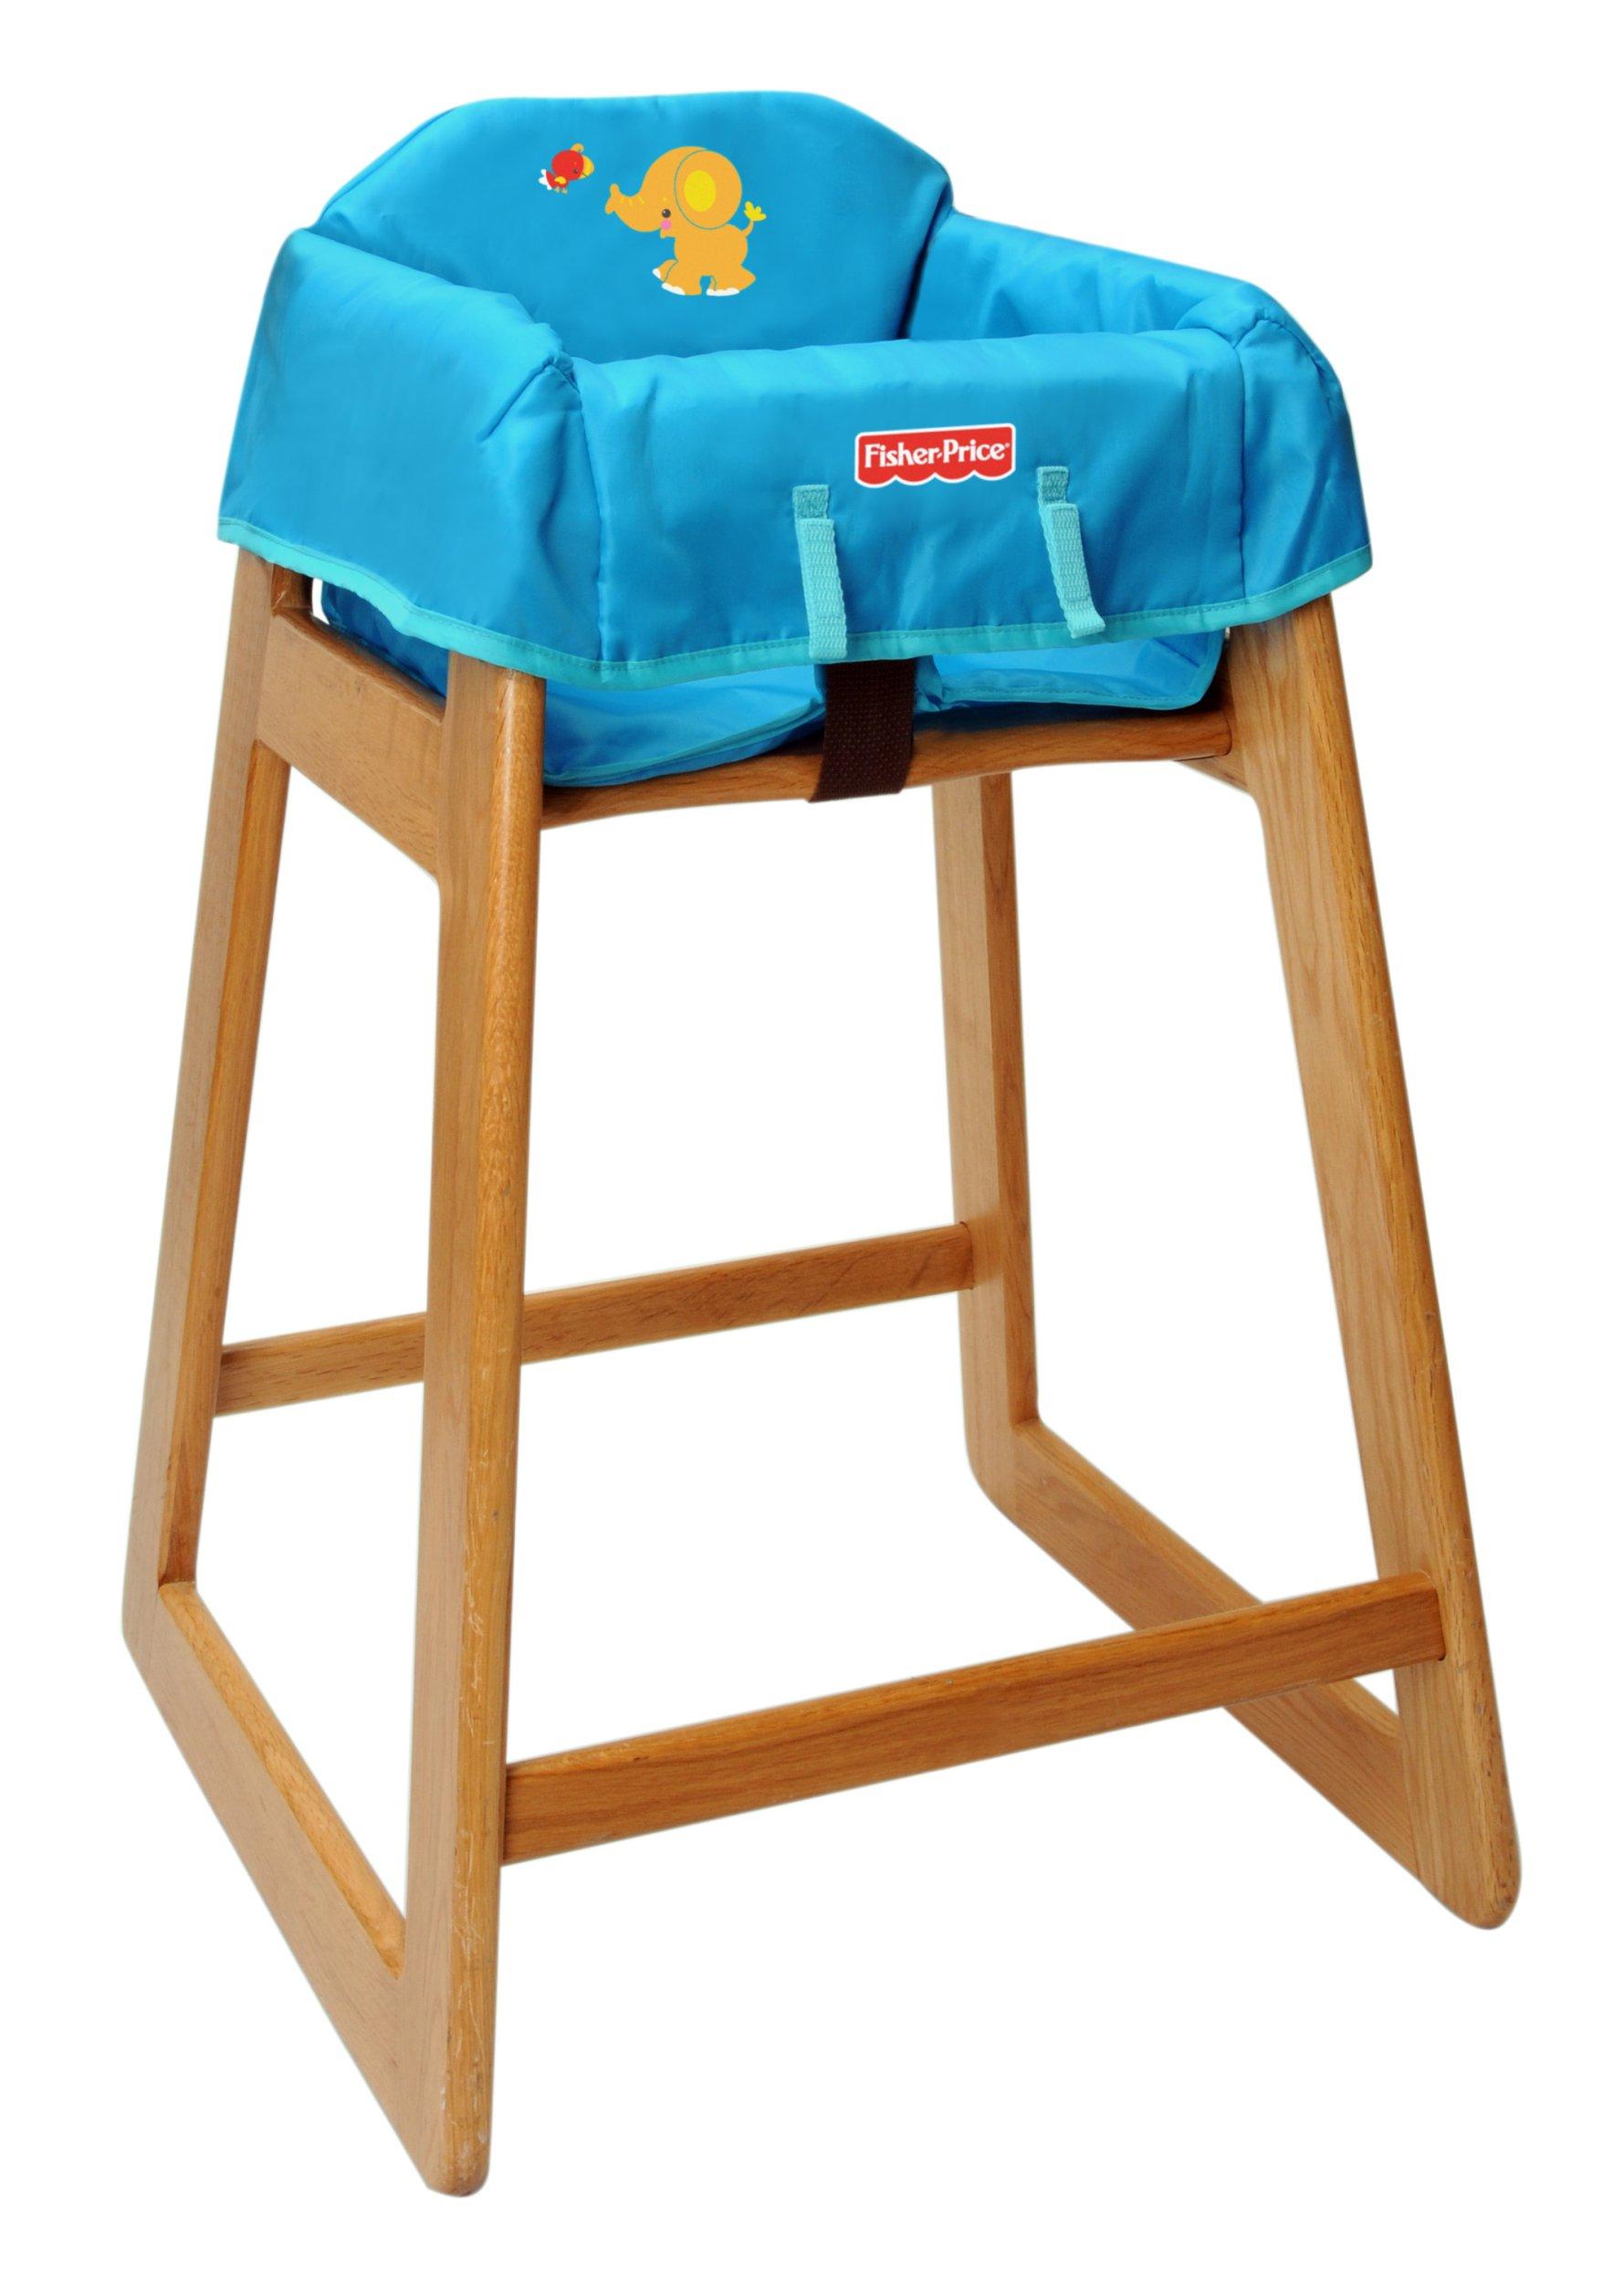 The Best Restaurant High Chairs Buungicom